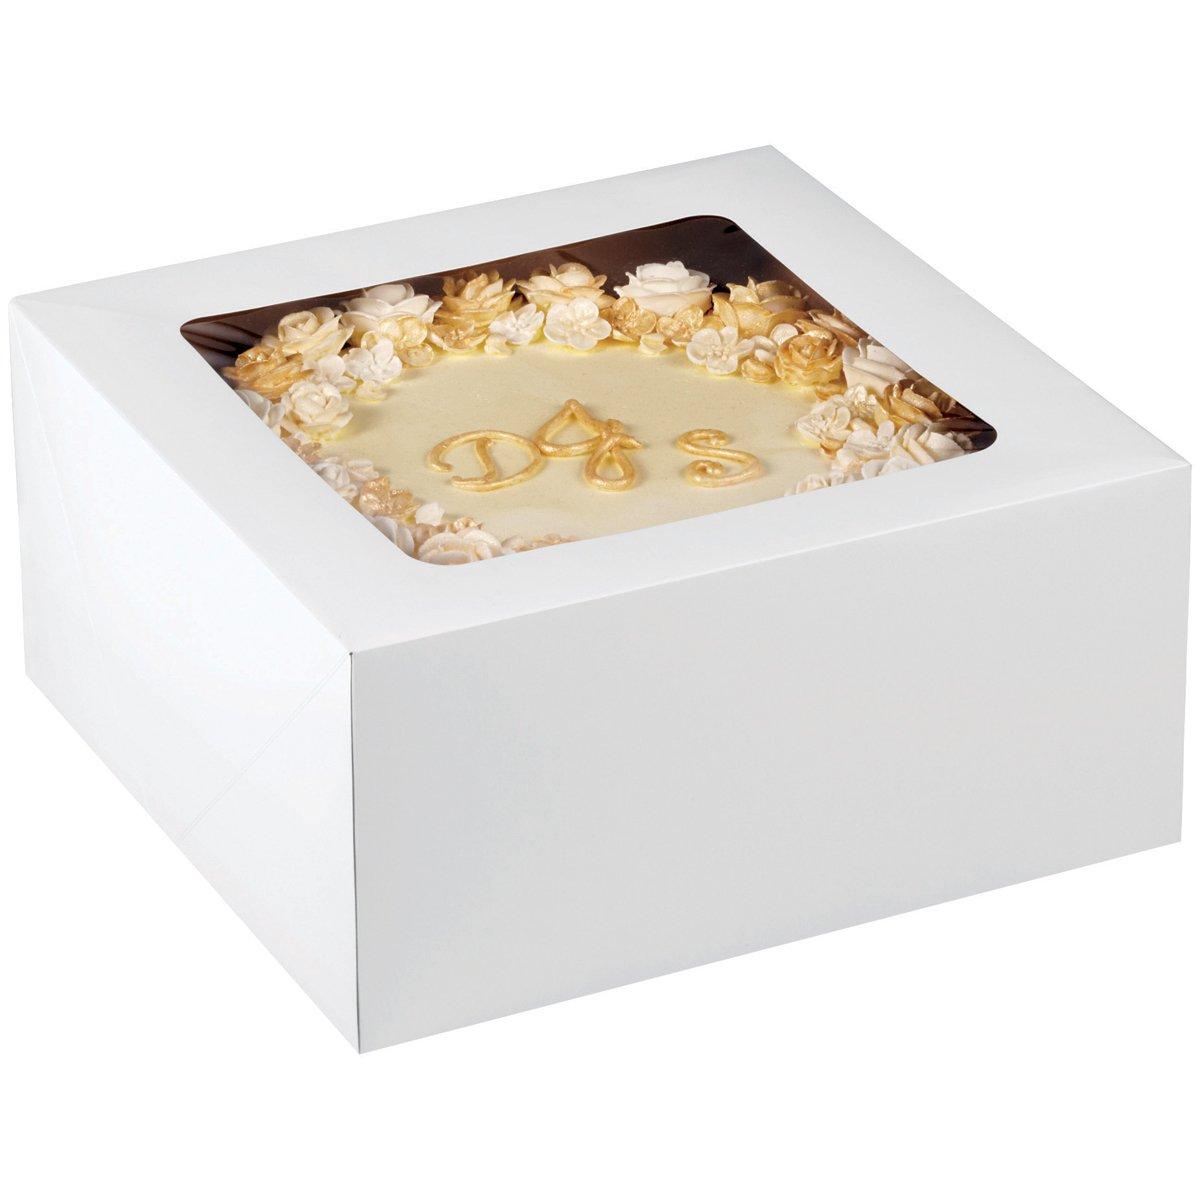 Ebay Cardboard Cake Boxes